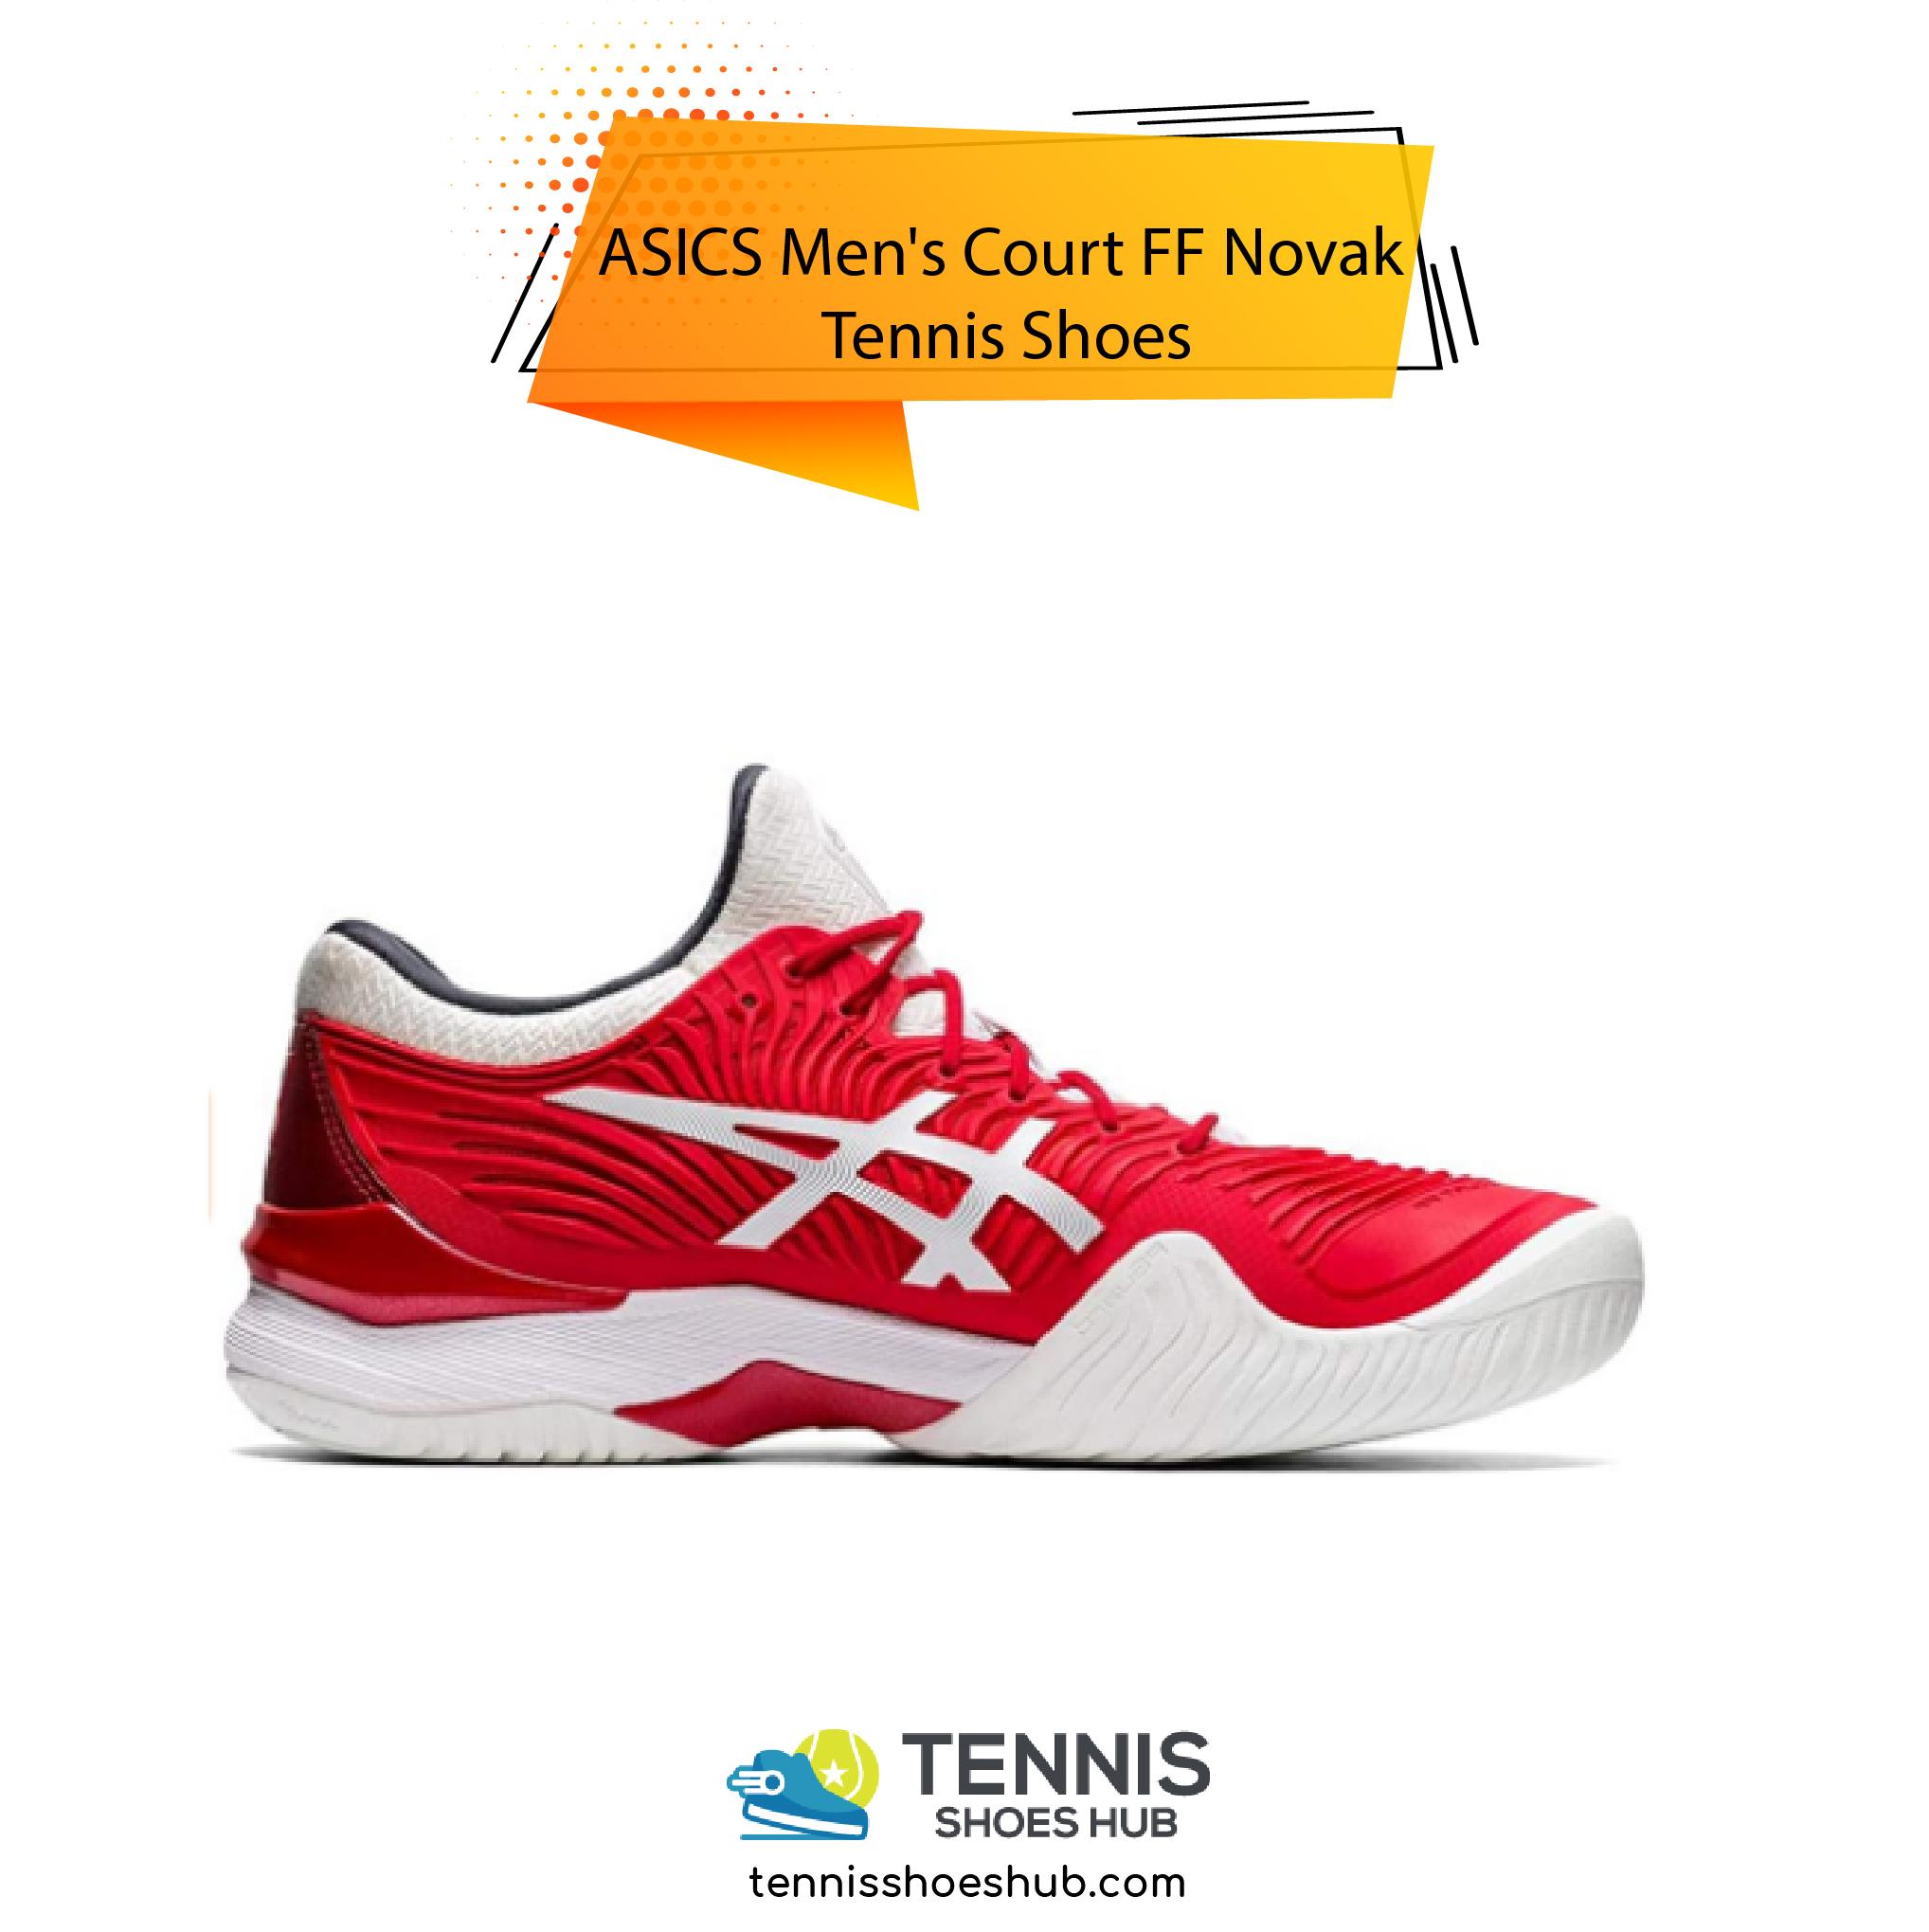 ASICS Mens Court FF Novak Tennis Shoes 01